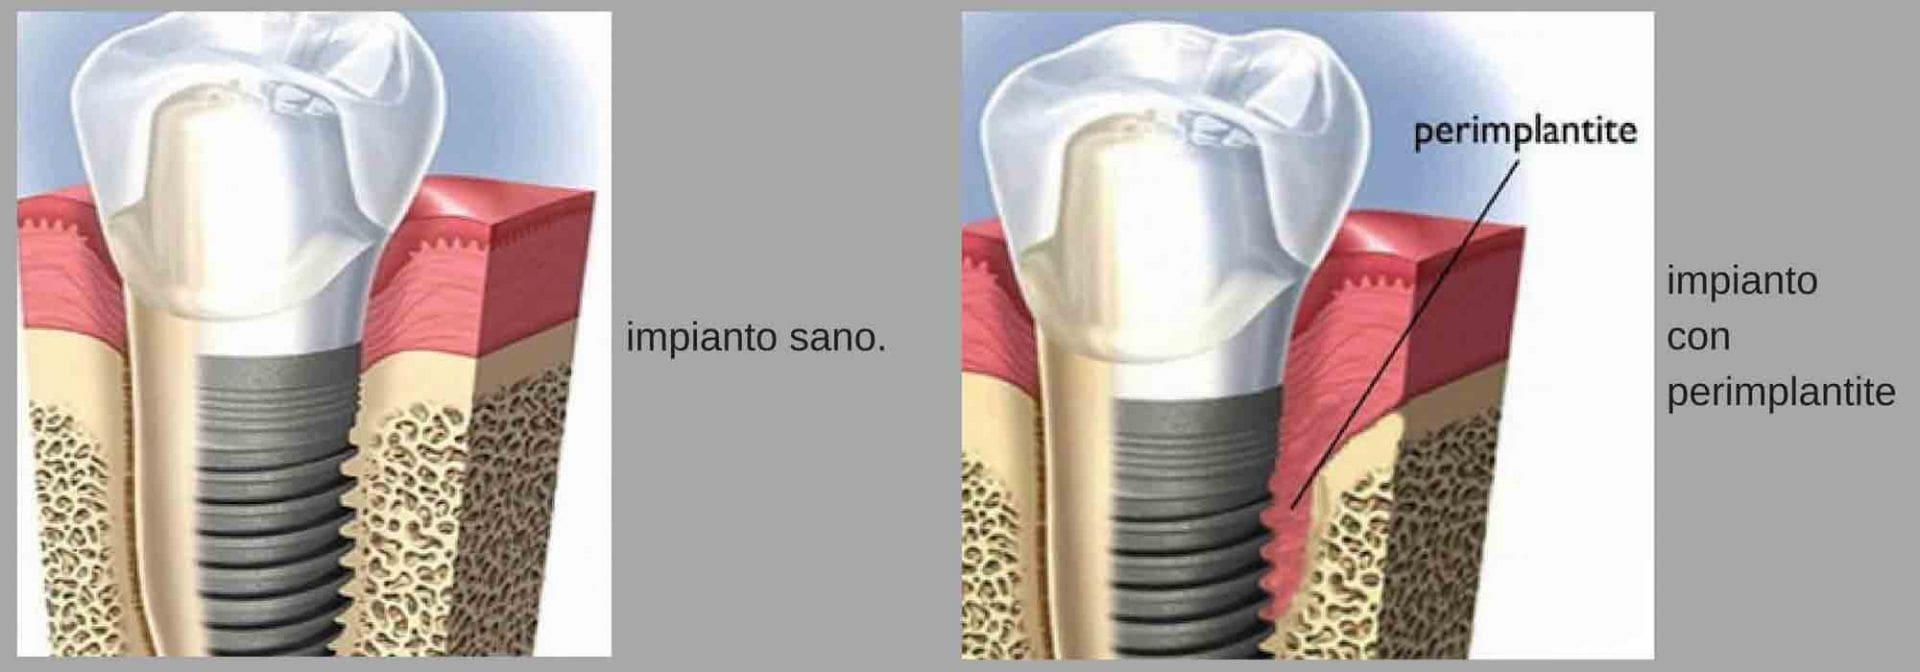 perimplantite impianto dentale